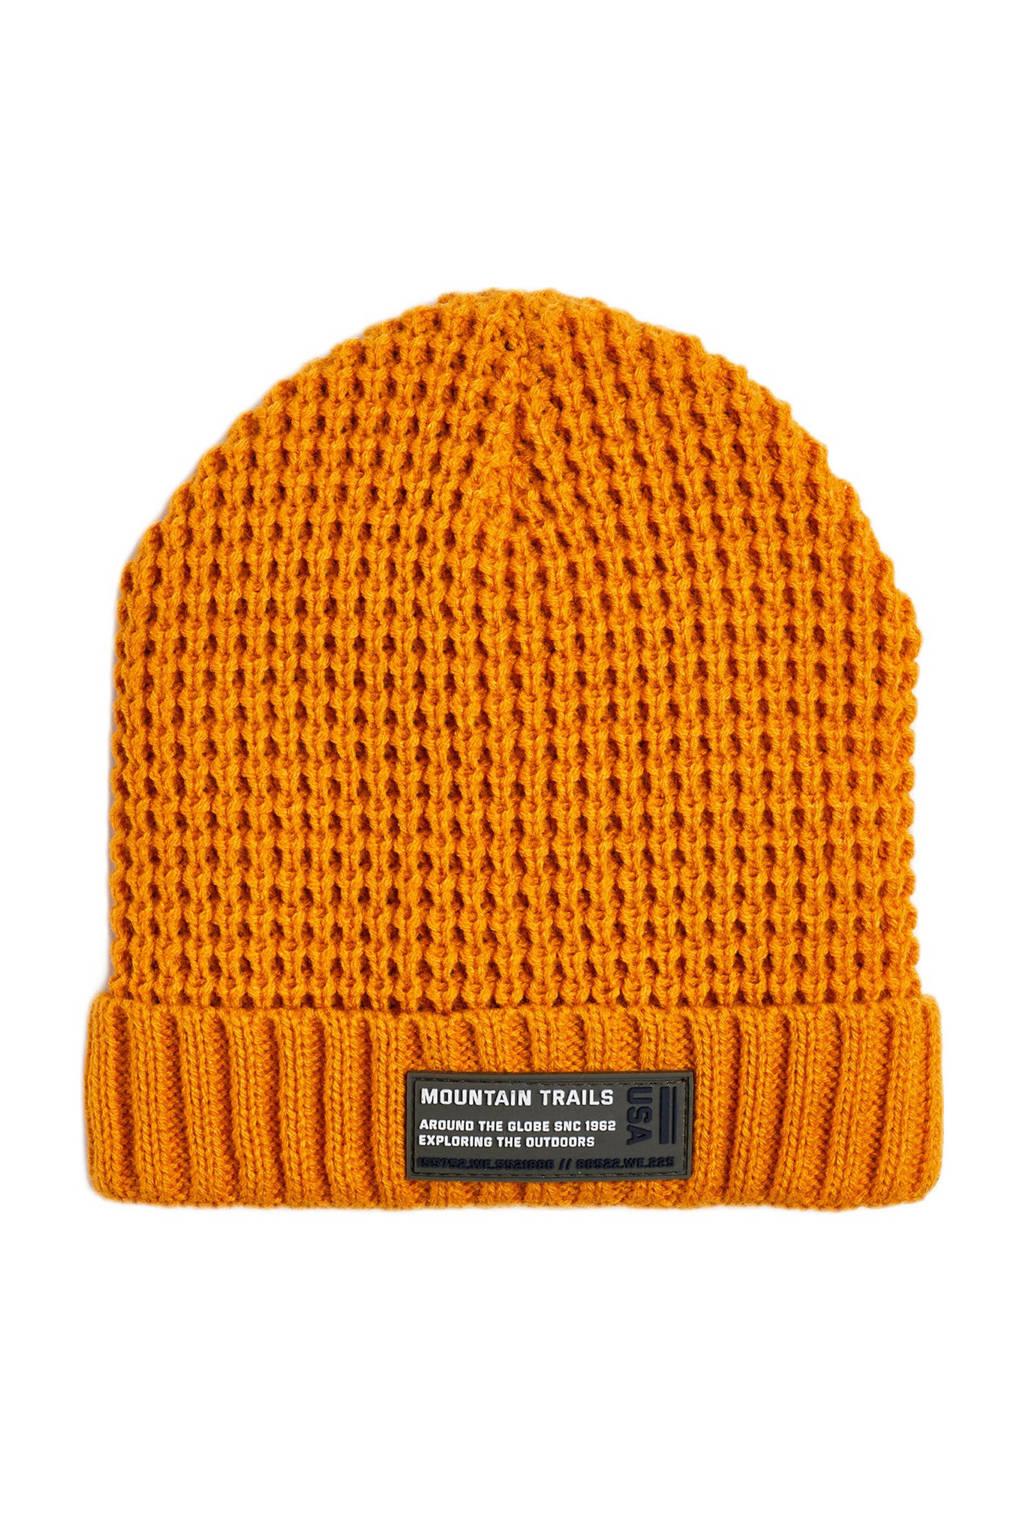 WE Fashion muts oranje, Sunflower